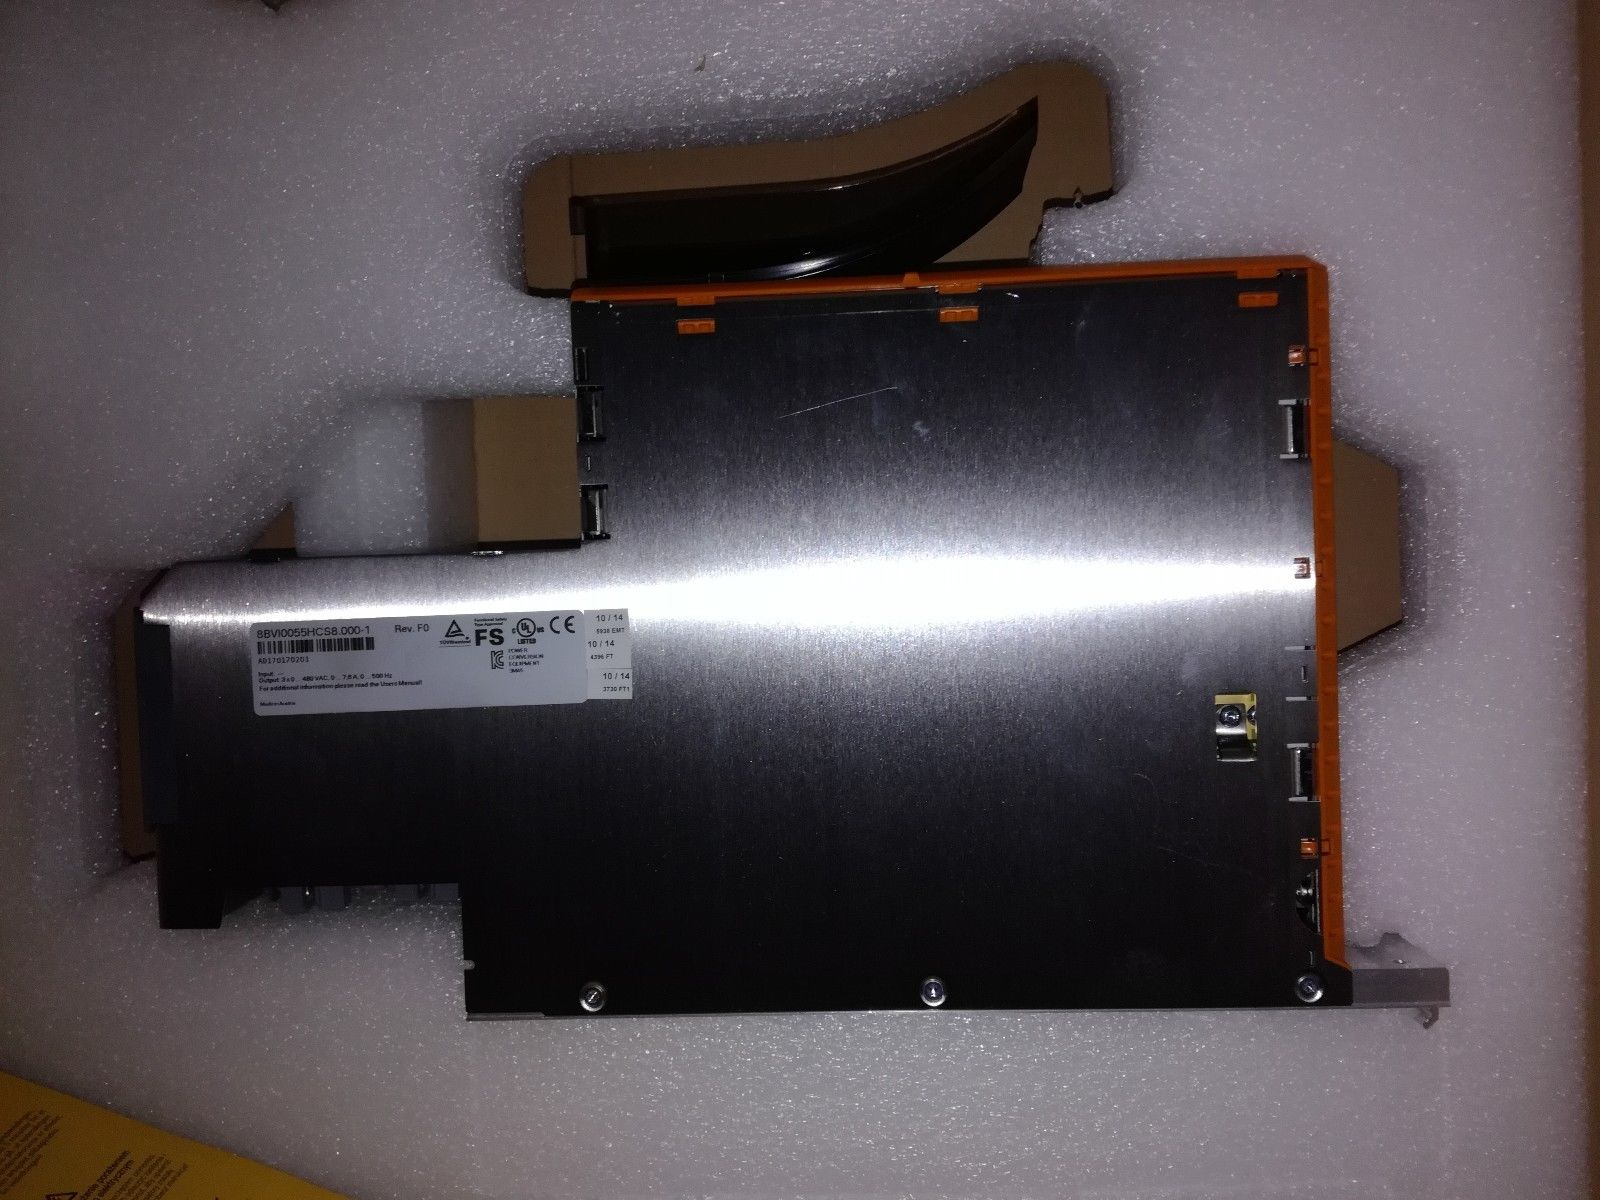 B&R显示屏 4PP120.1043-31